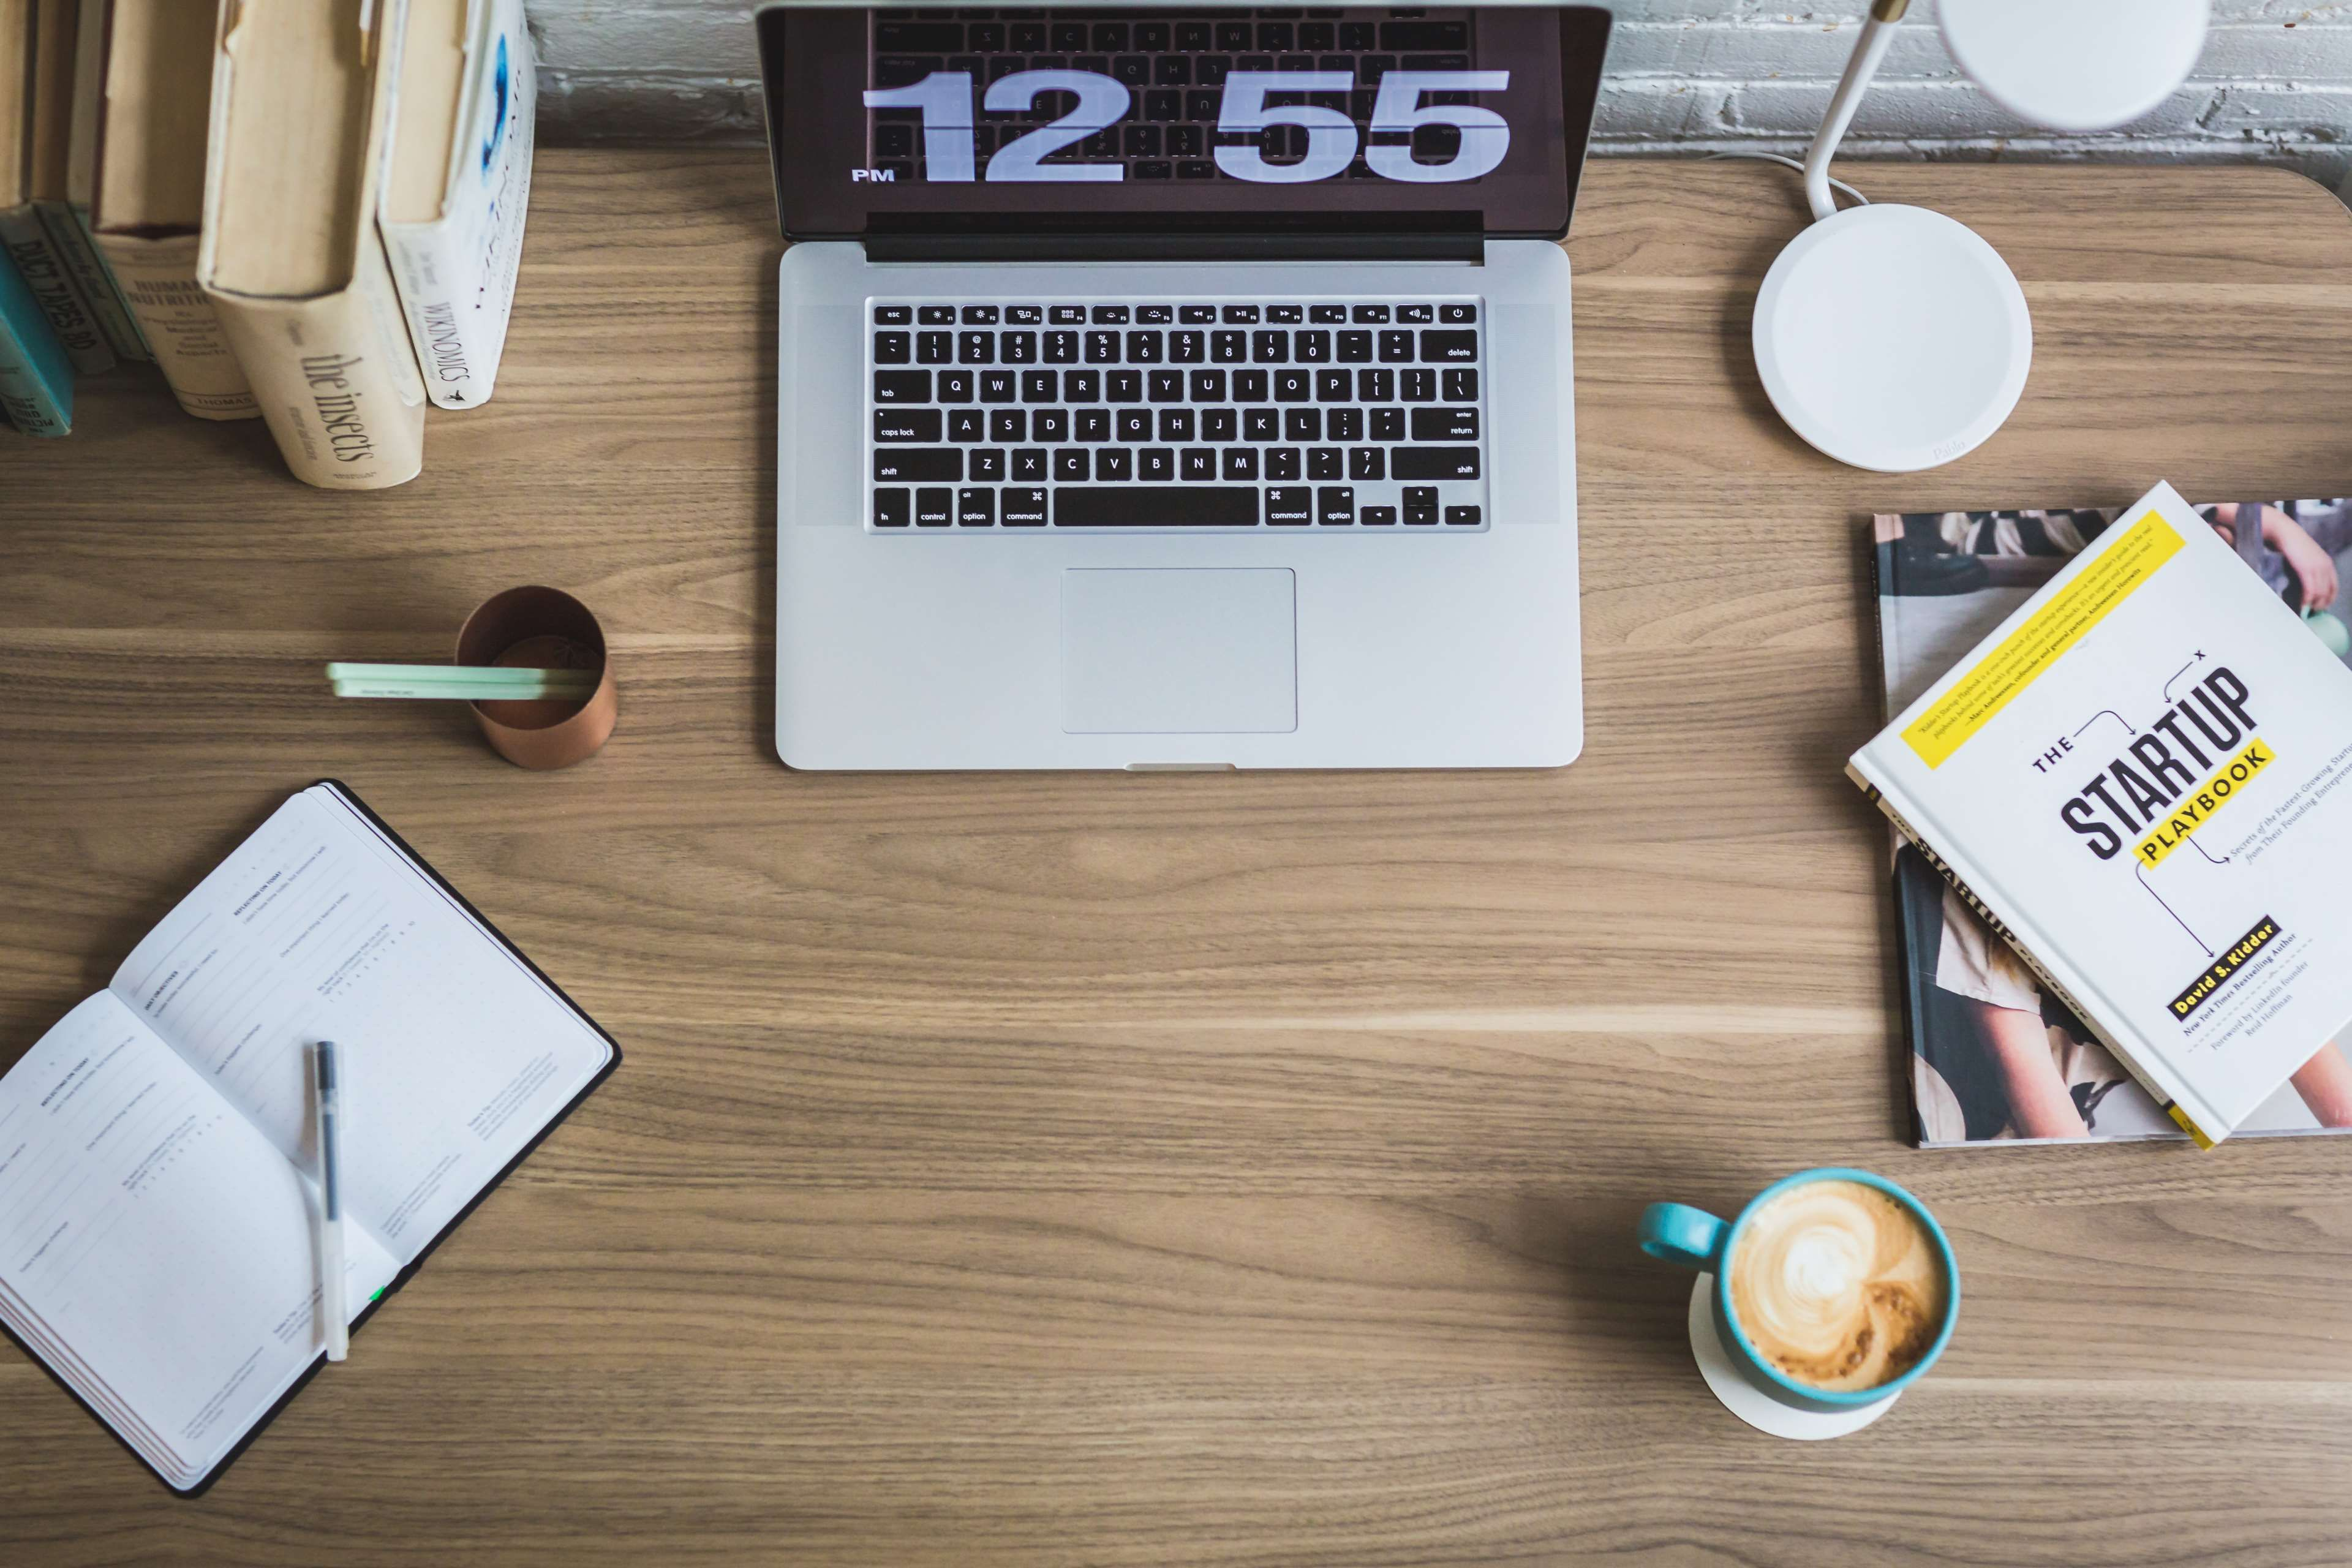 Work Desk Writer Author Creative Writing Concept Equipment